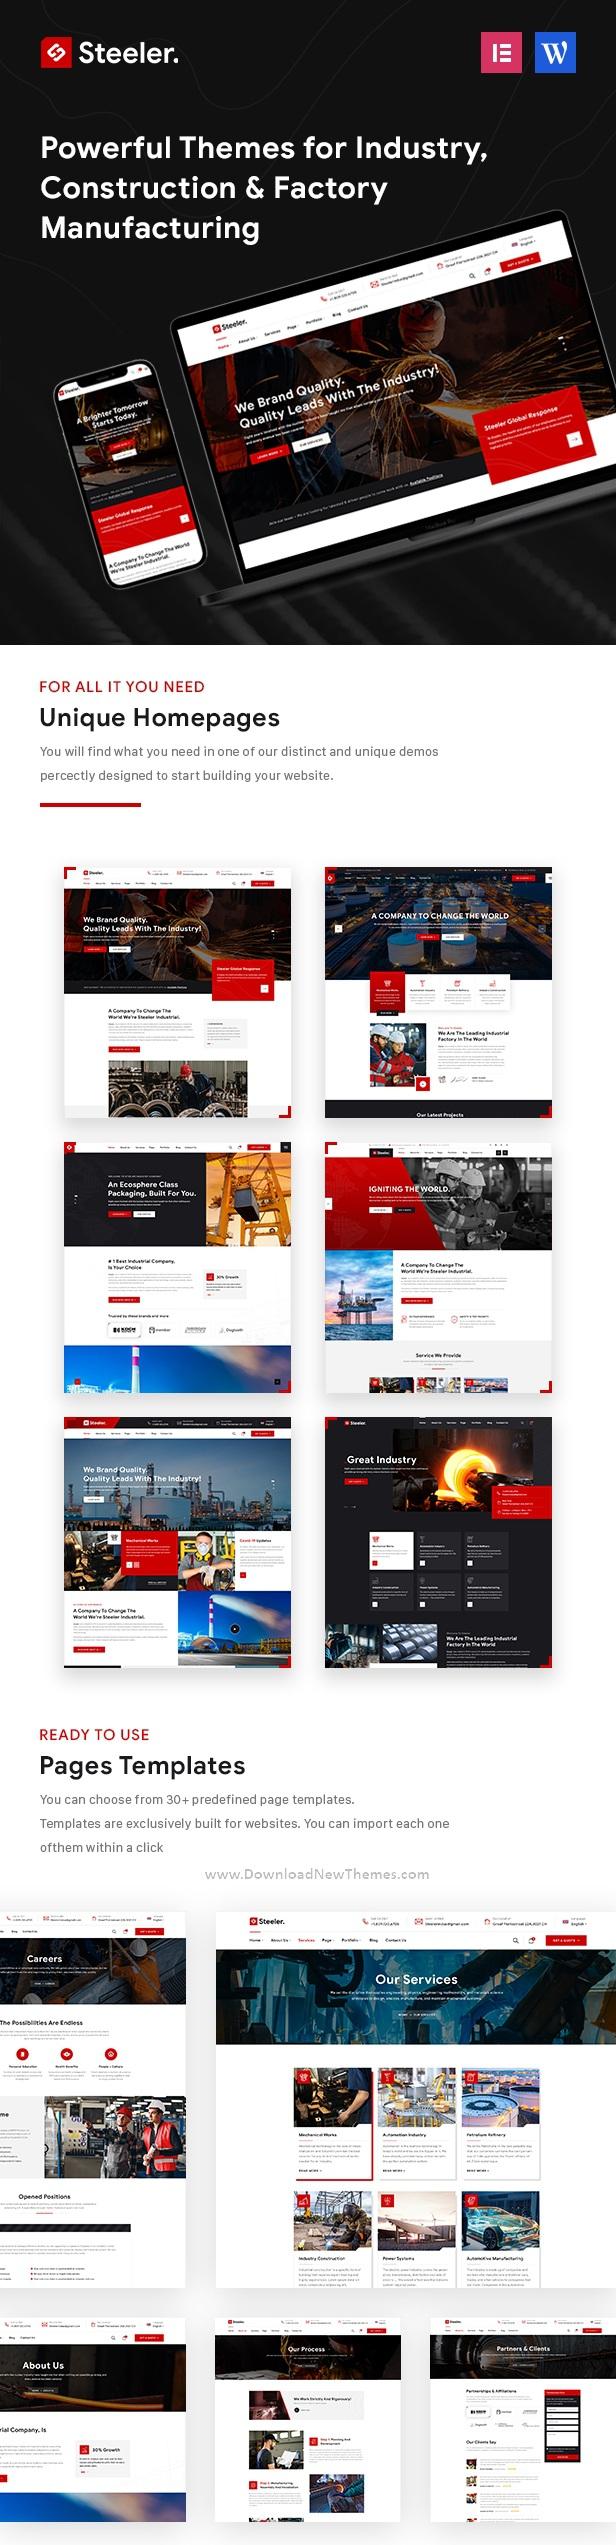 Industrial & Manufacturing WordPress Theme